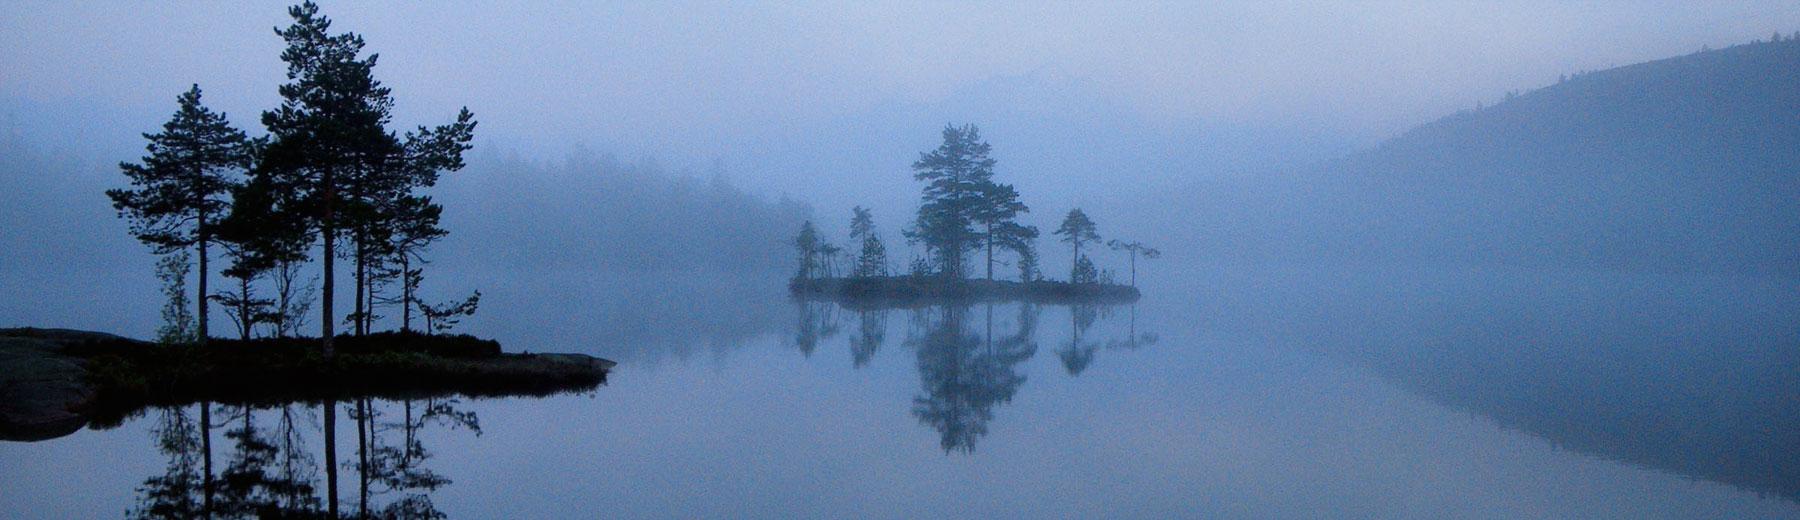 Foggy lake in Algonquin Park, Ontario